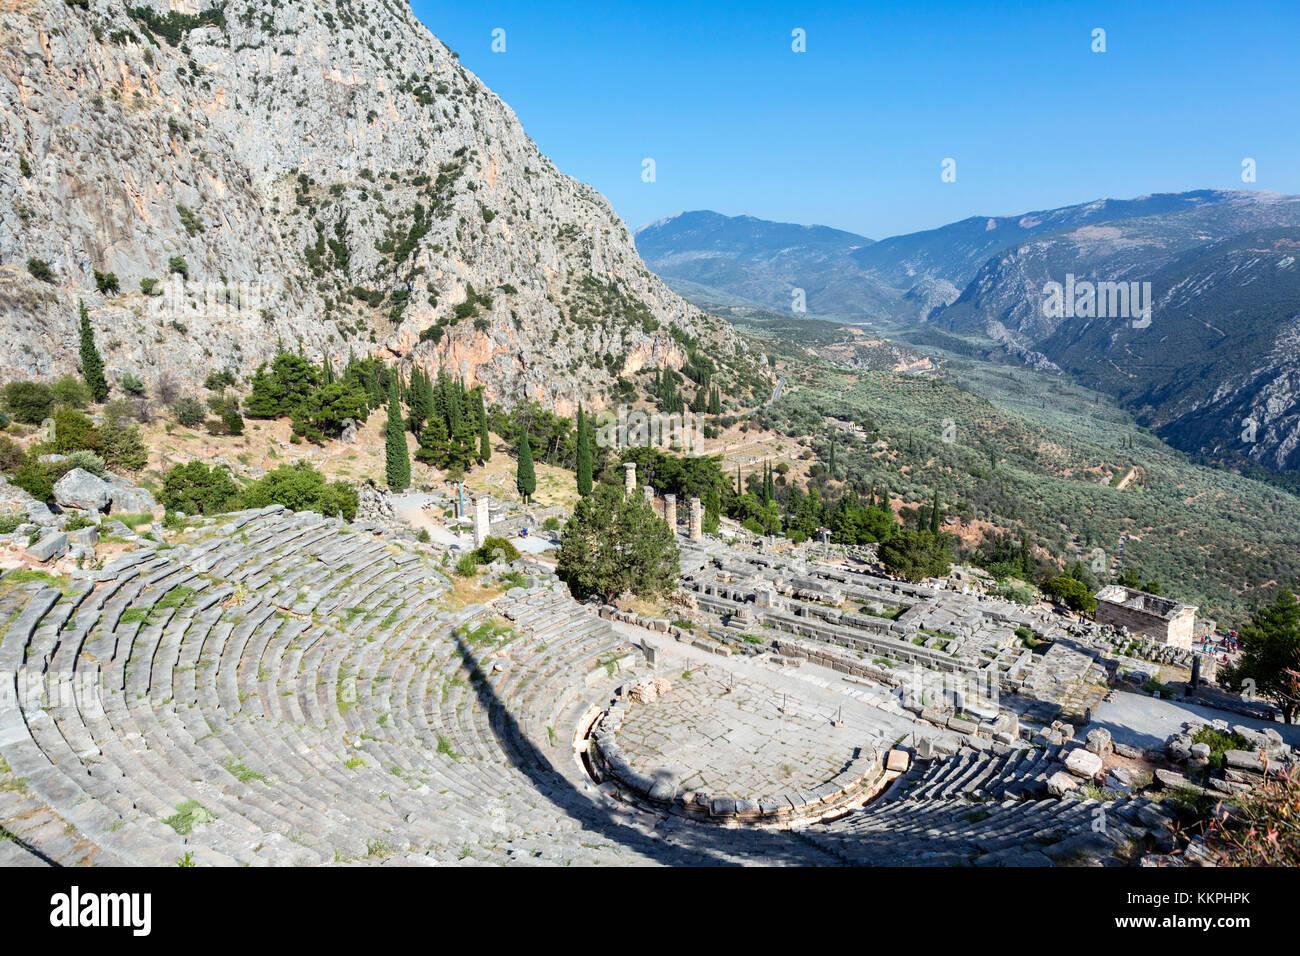 View over the amphitheatre and the Temple of Apollo, Delphi, Greece - Stock Image